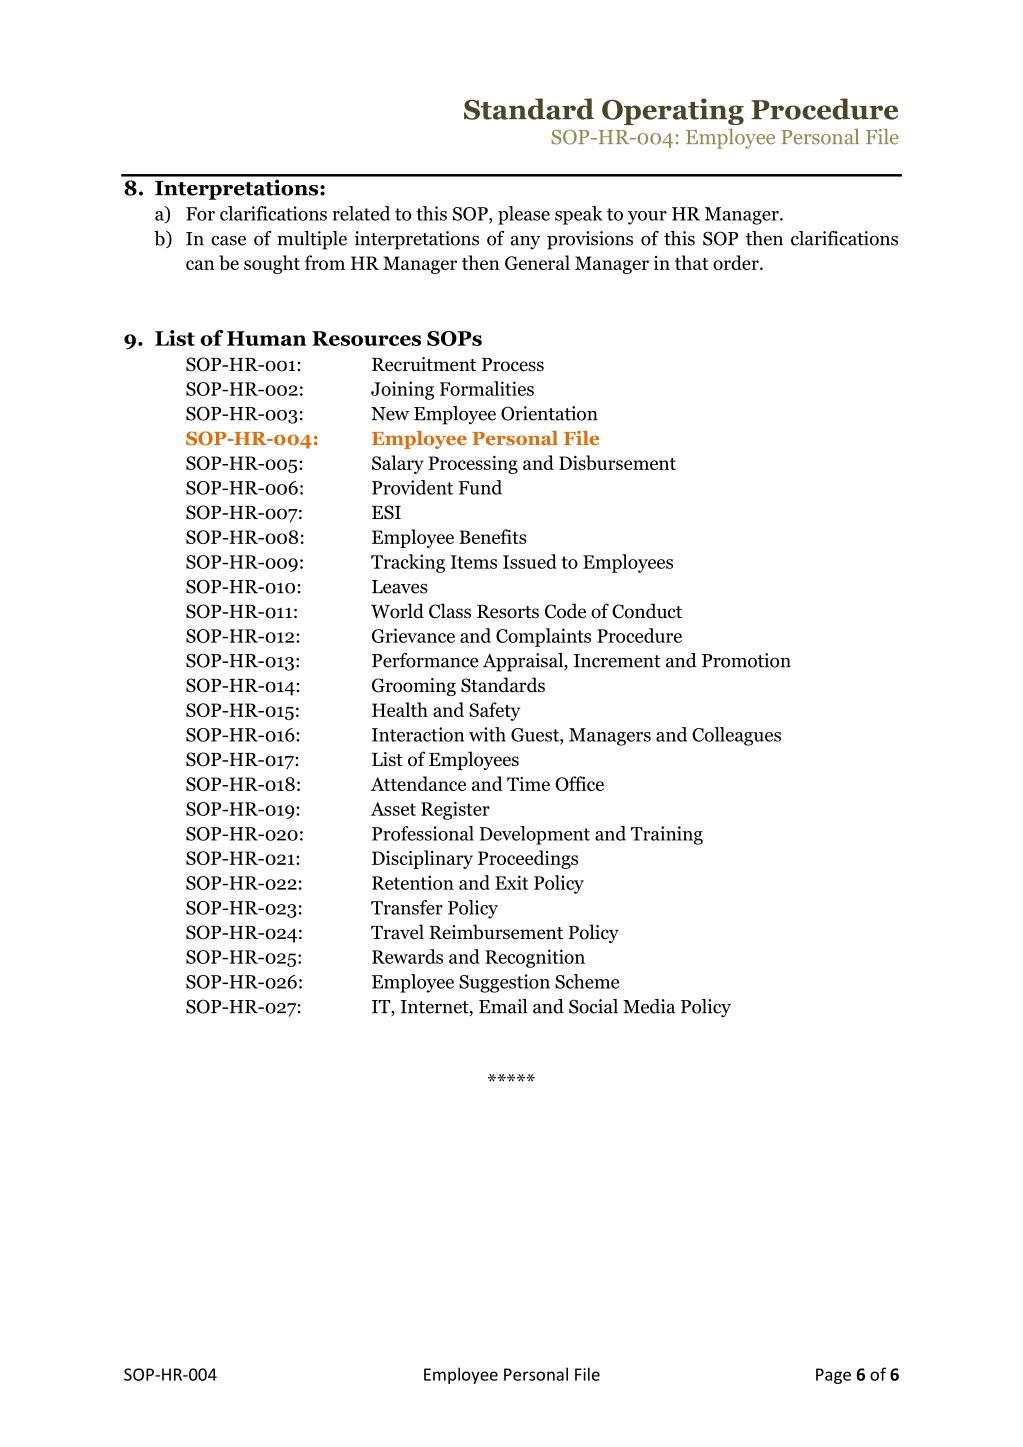 PPT - standard operating procedure template PowerPoint